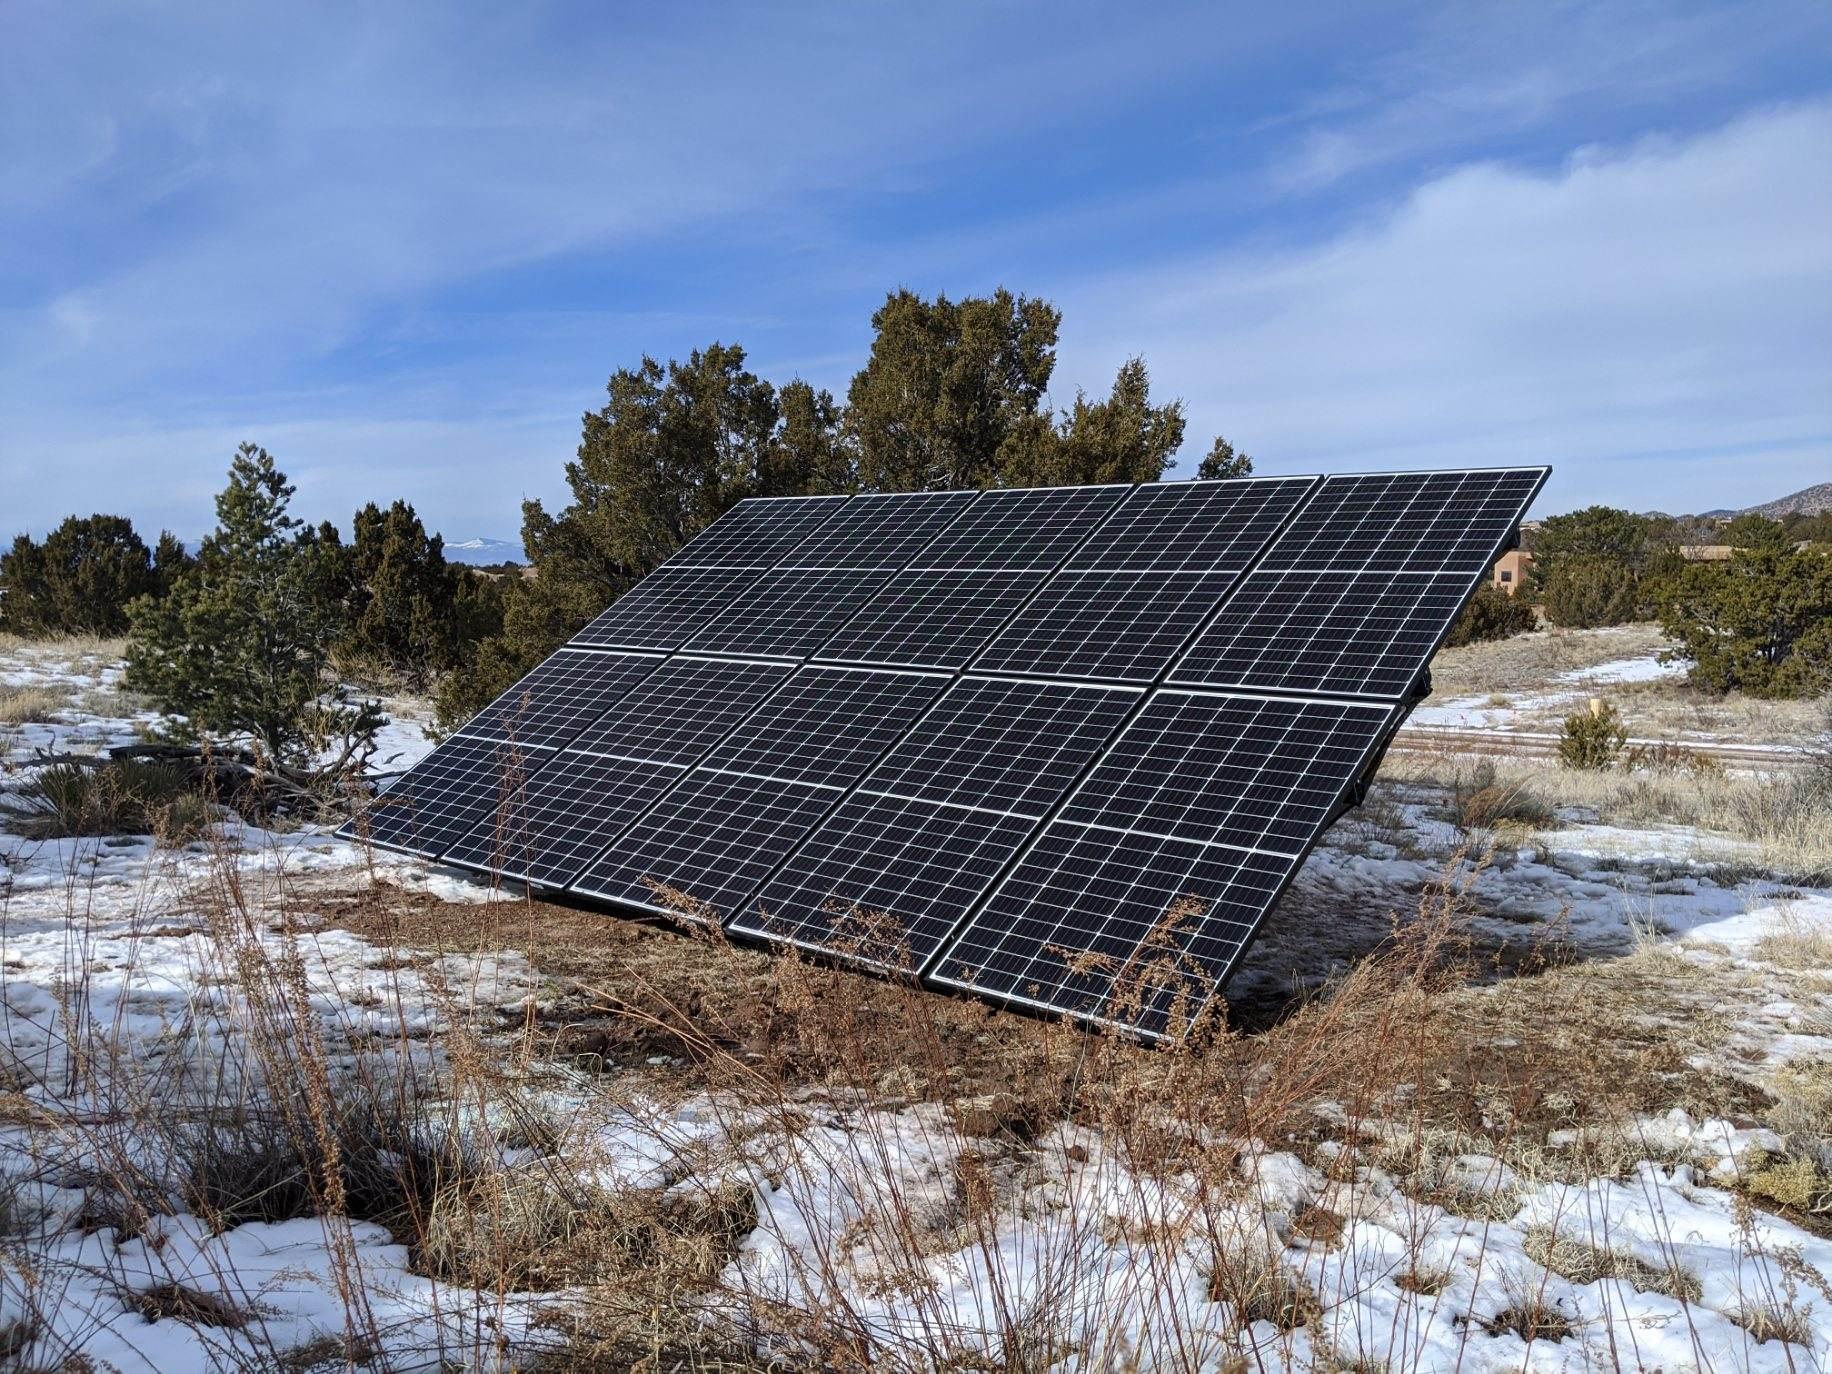 Ground Mounted Solar Panel Installation, Santa Fe